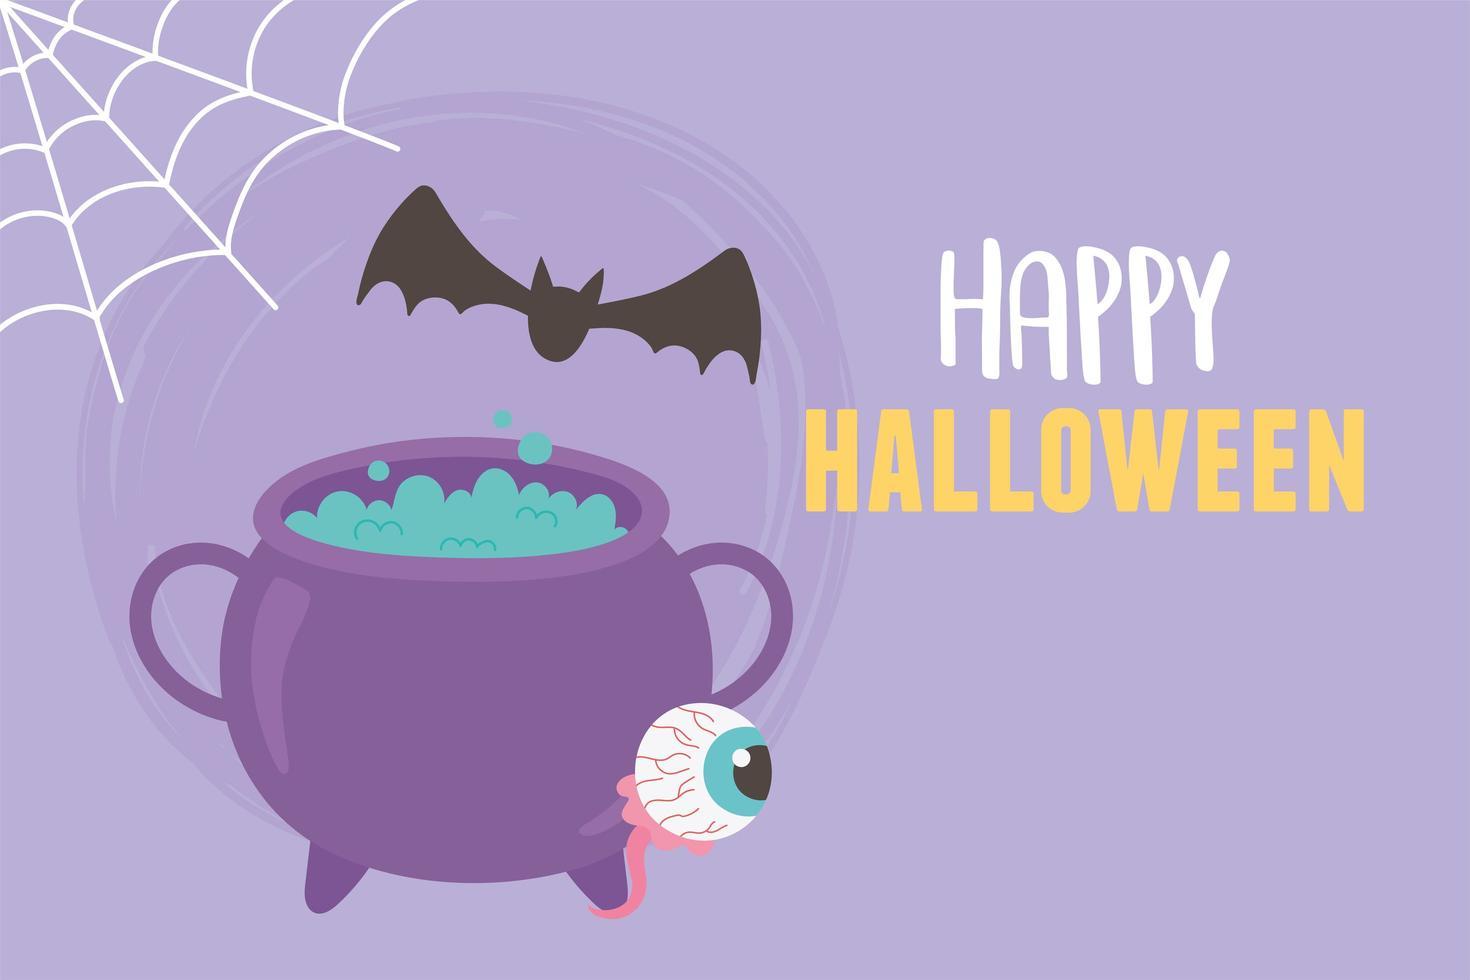 fijne Halloween. ketel, vleermuis, spinneweb en spookachtig oog vector